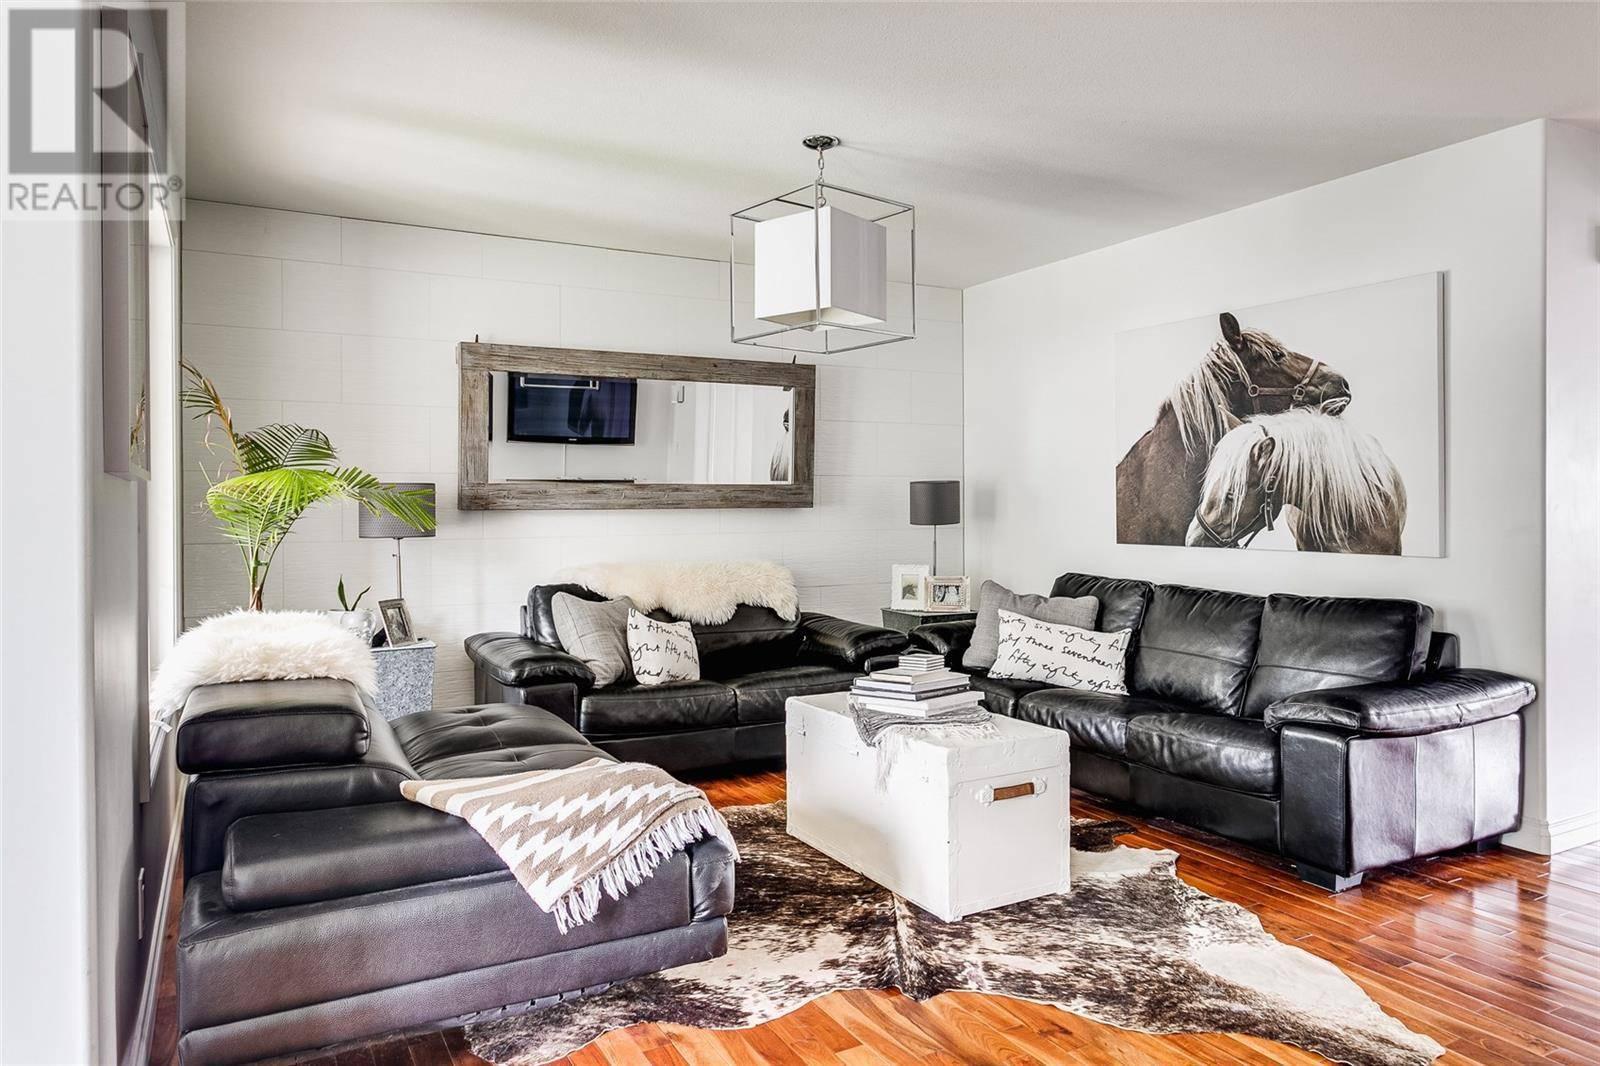 House for sale at 1147 M Ave S Saskatoon Saskatchewan - MLS: SK784280